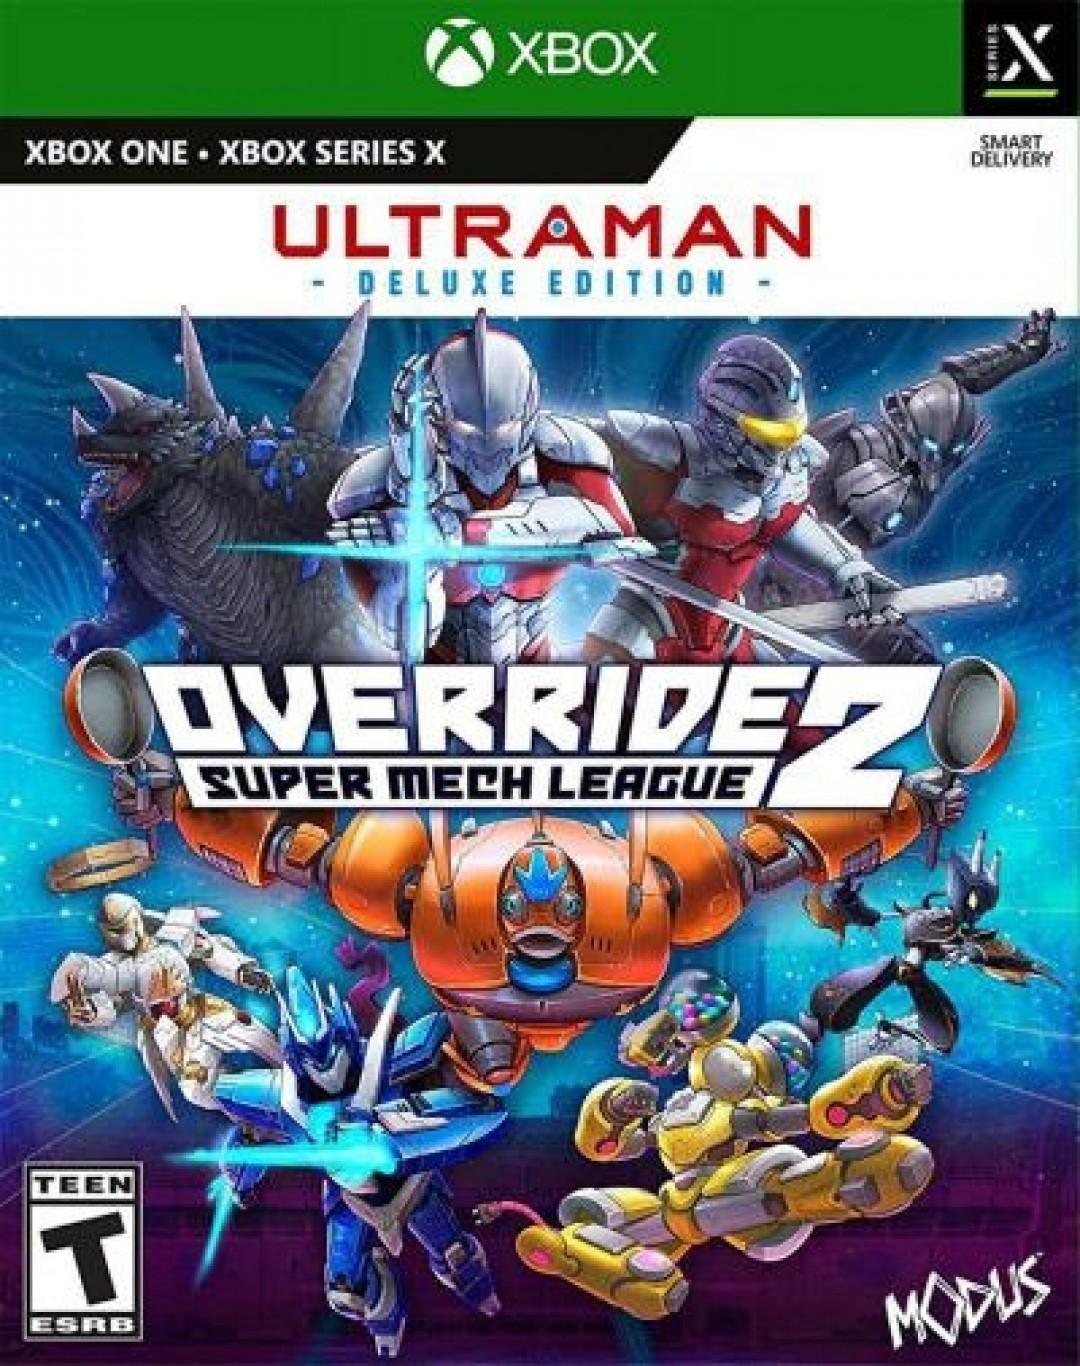 Override 2: Super Mech League (Ultraman Deluxe Edition)